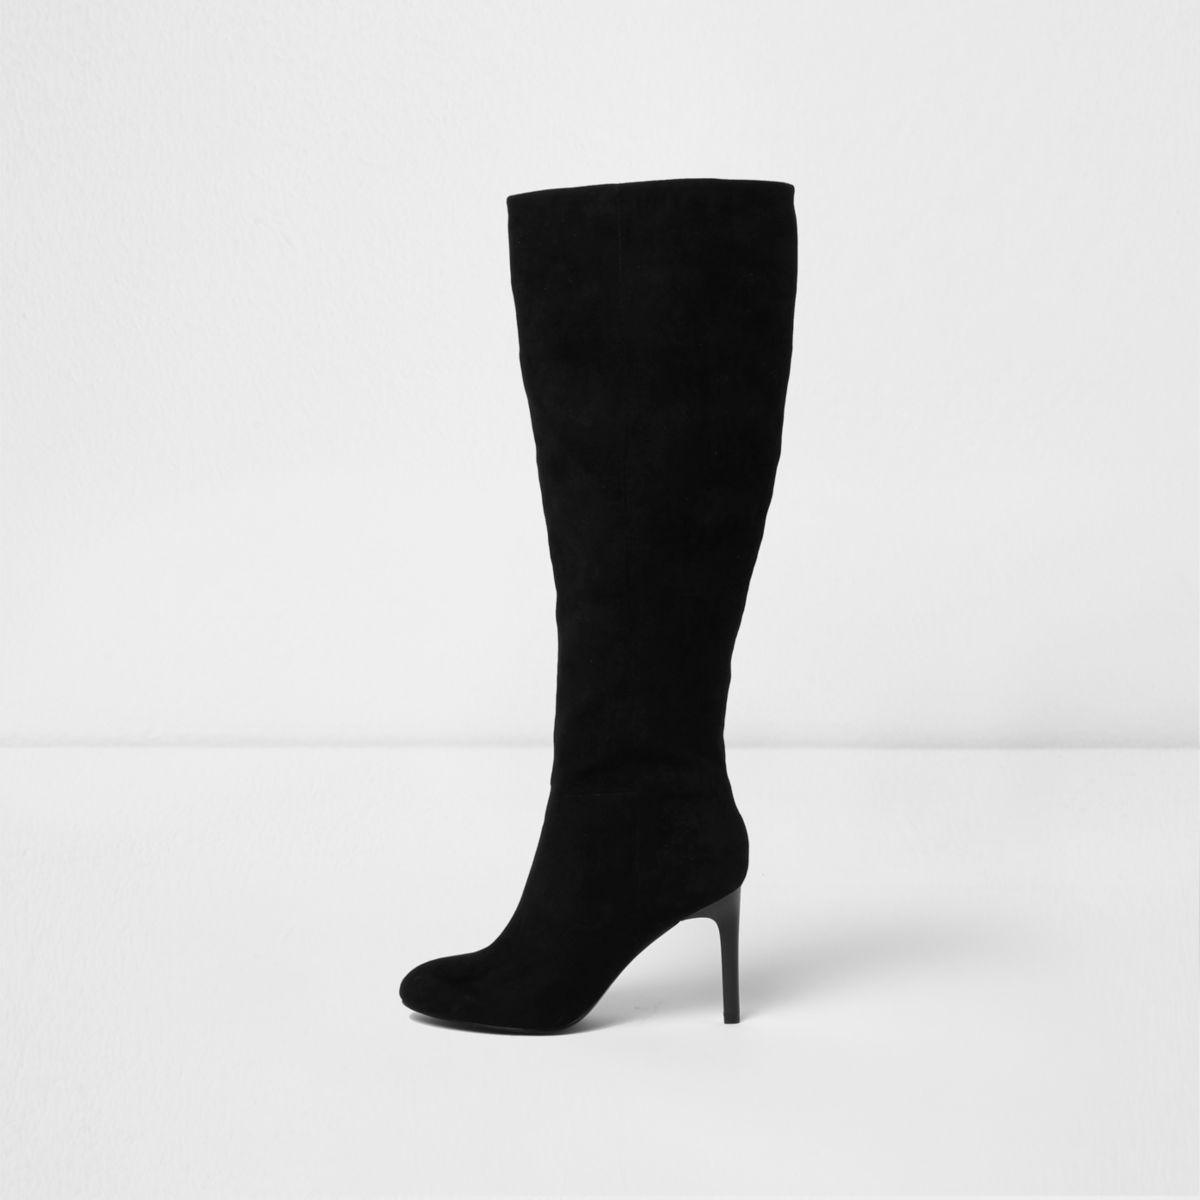 Black stiletto heel over the knee boots